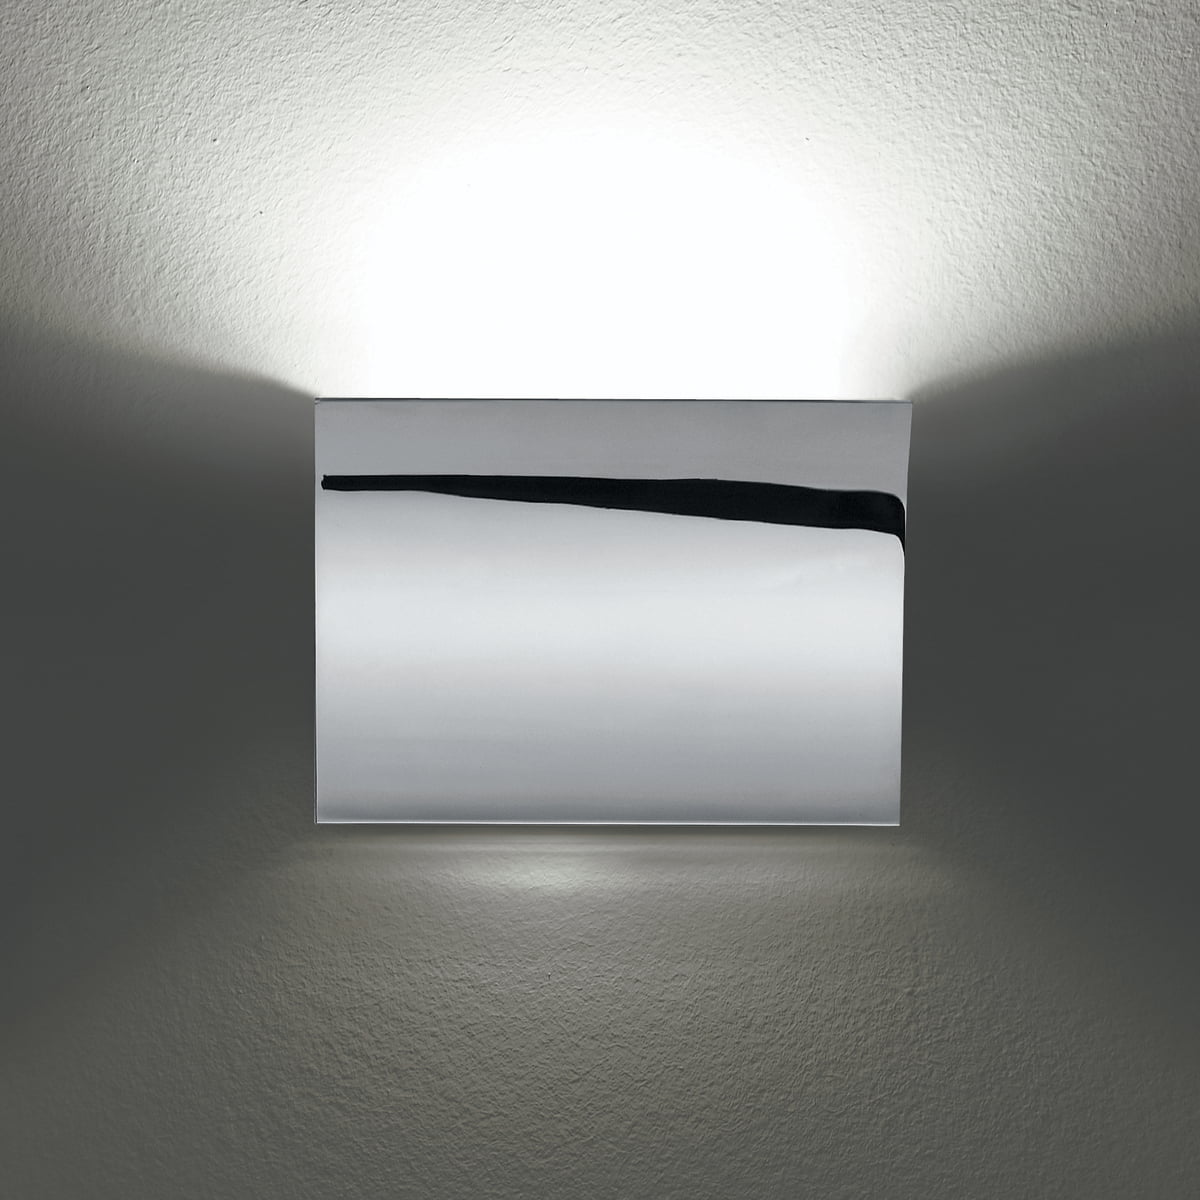 pochette led up down wandleuchte von flos connox. Black Bedroom Furniture Sets. Home Design Ideas